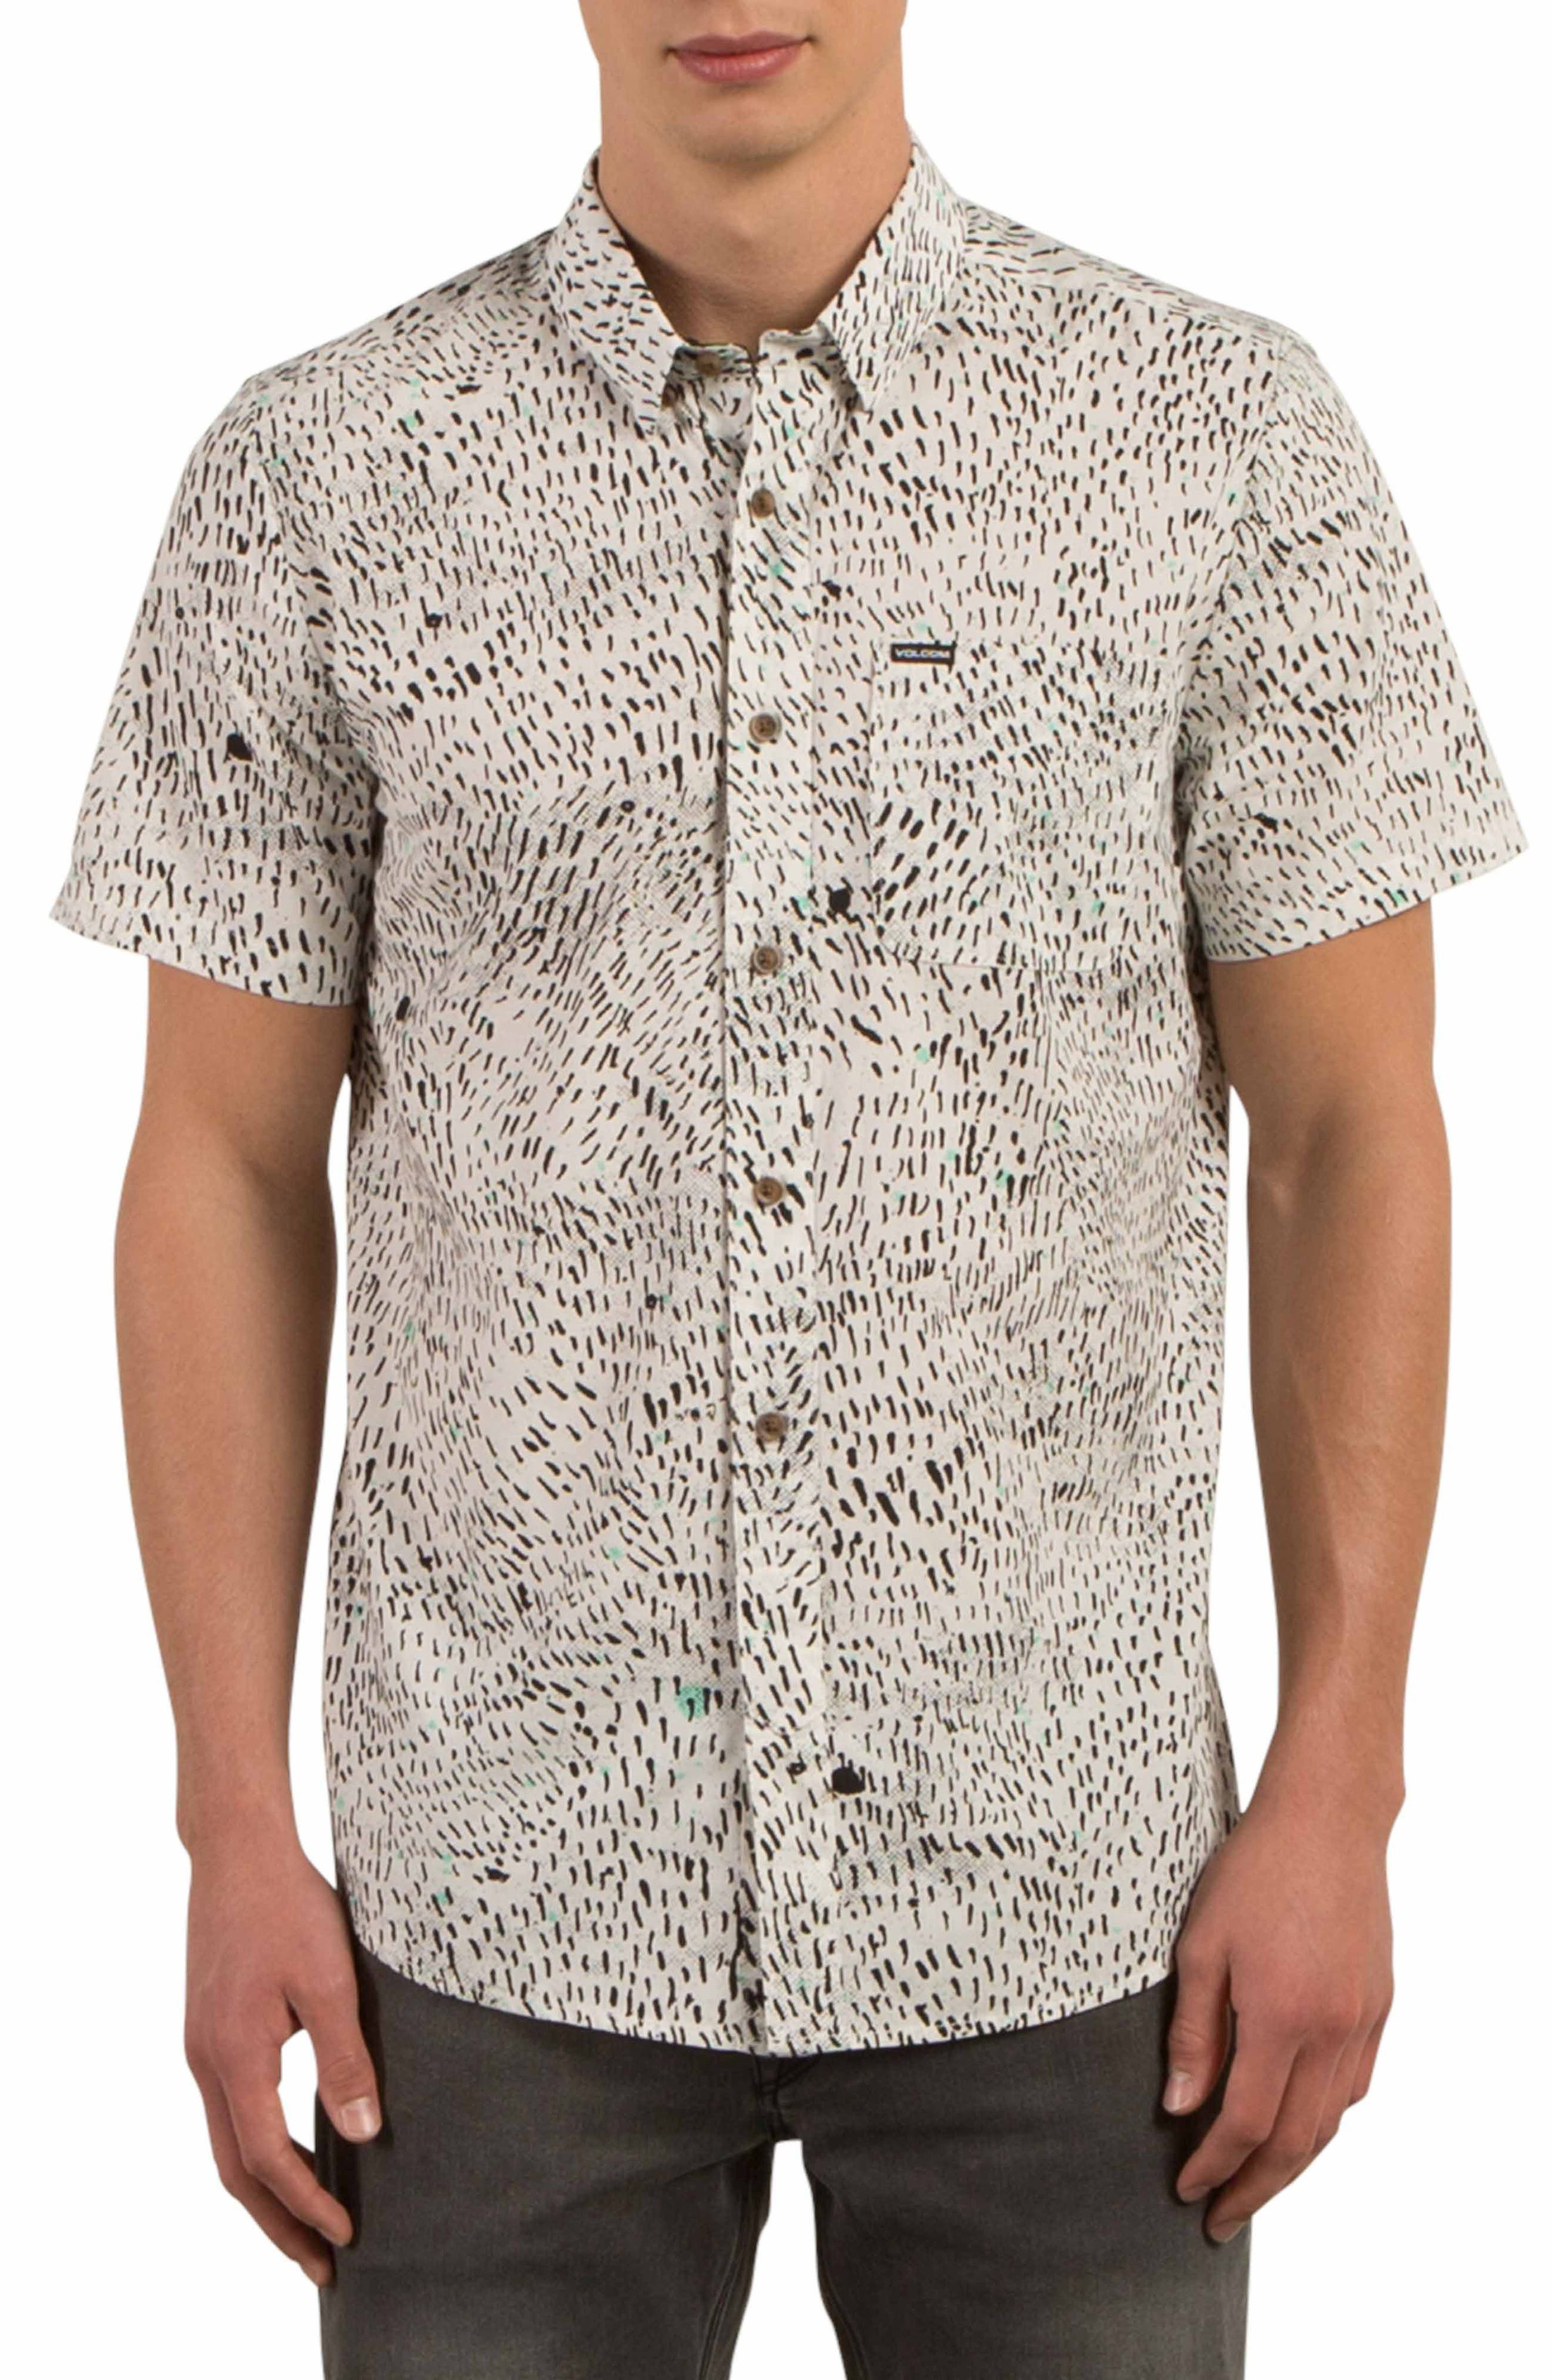 Volcom Primitive Noize Print Shirt